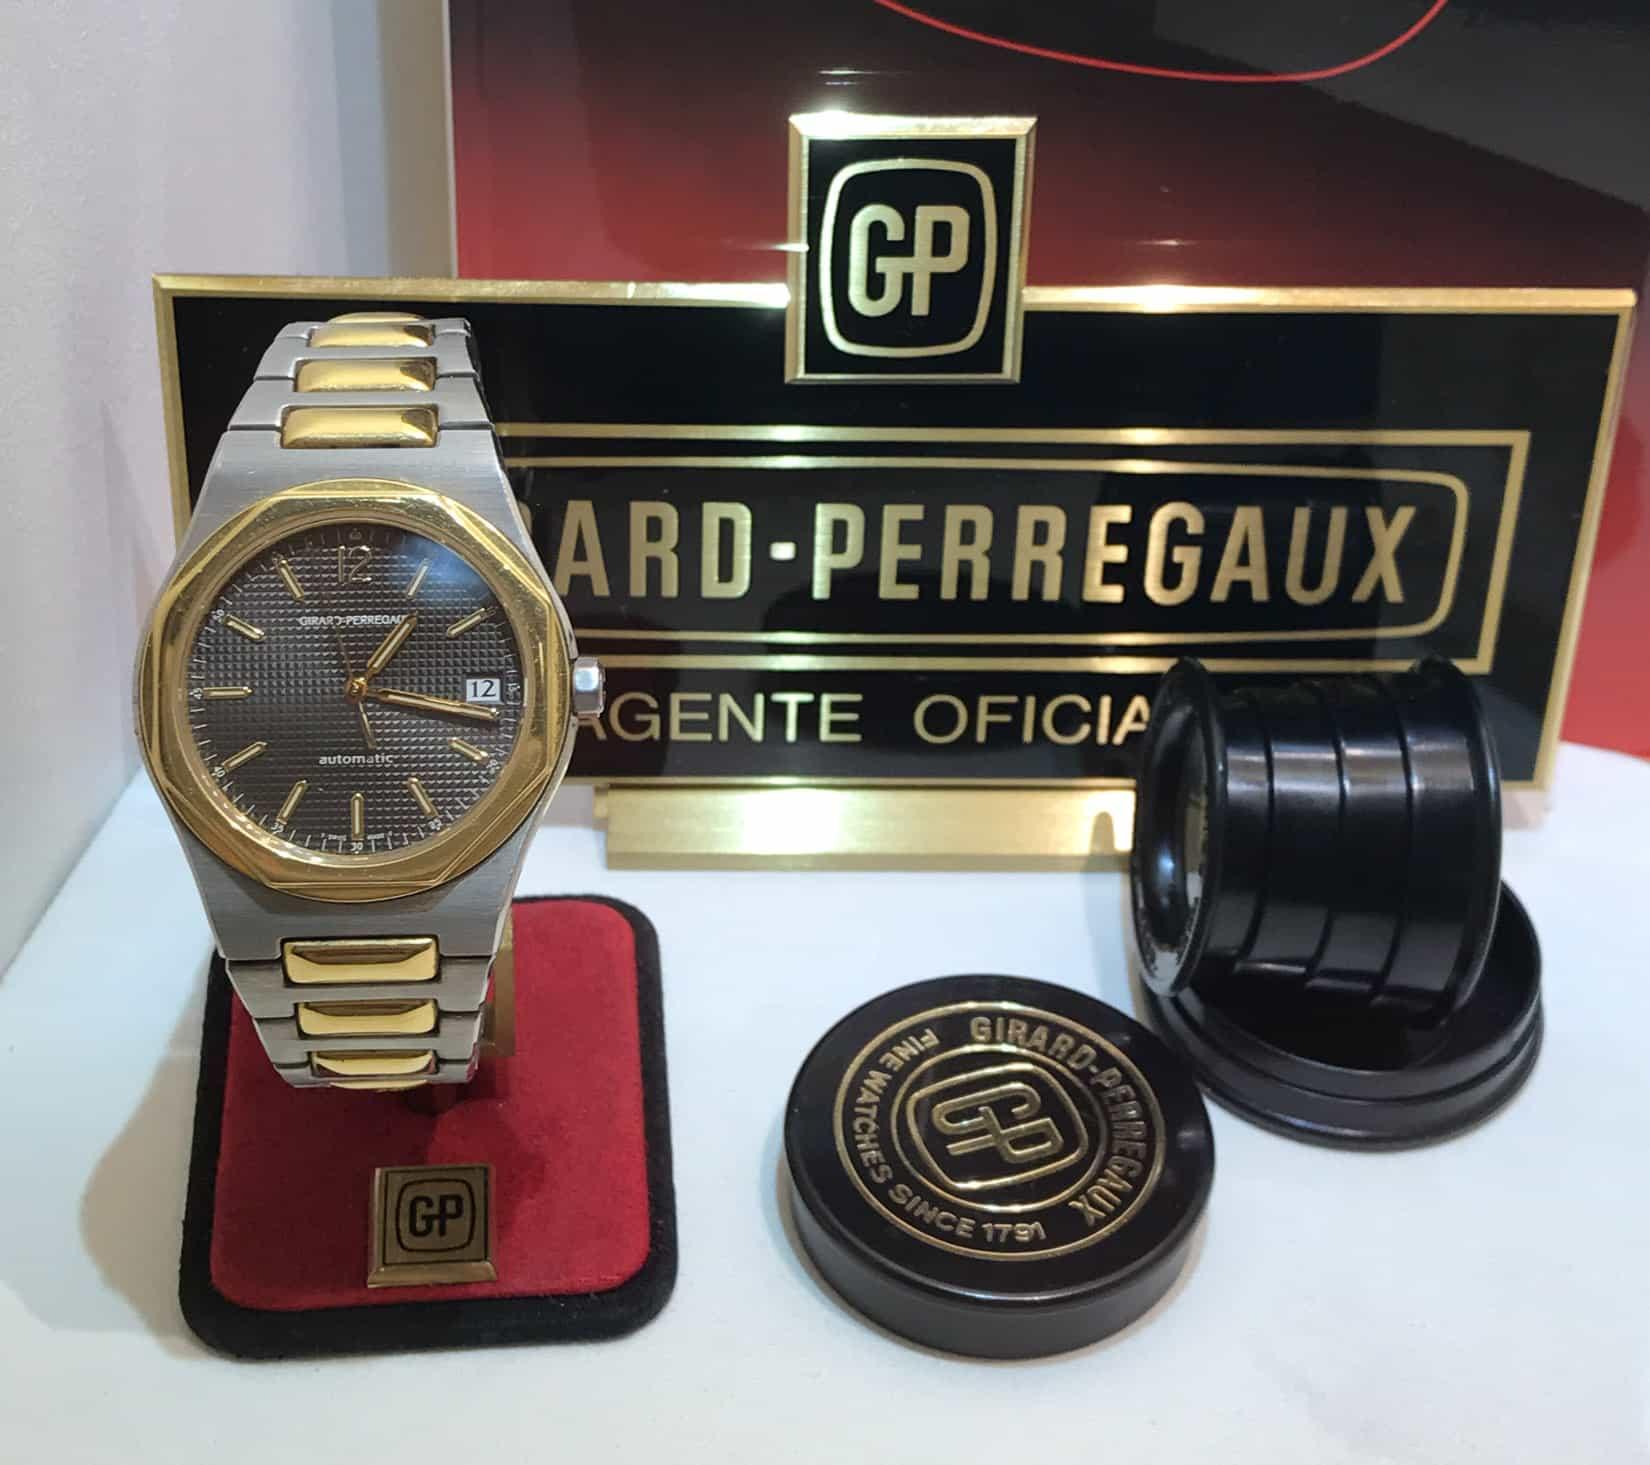 Girard-Perregaux Laureatp